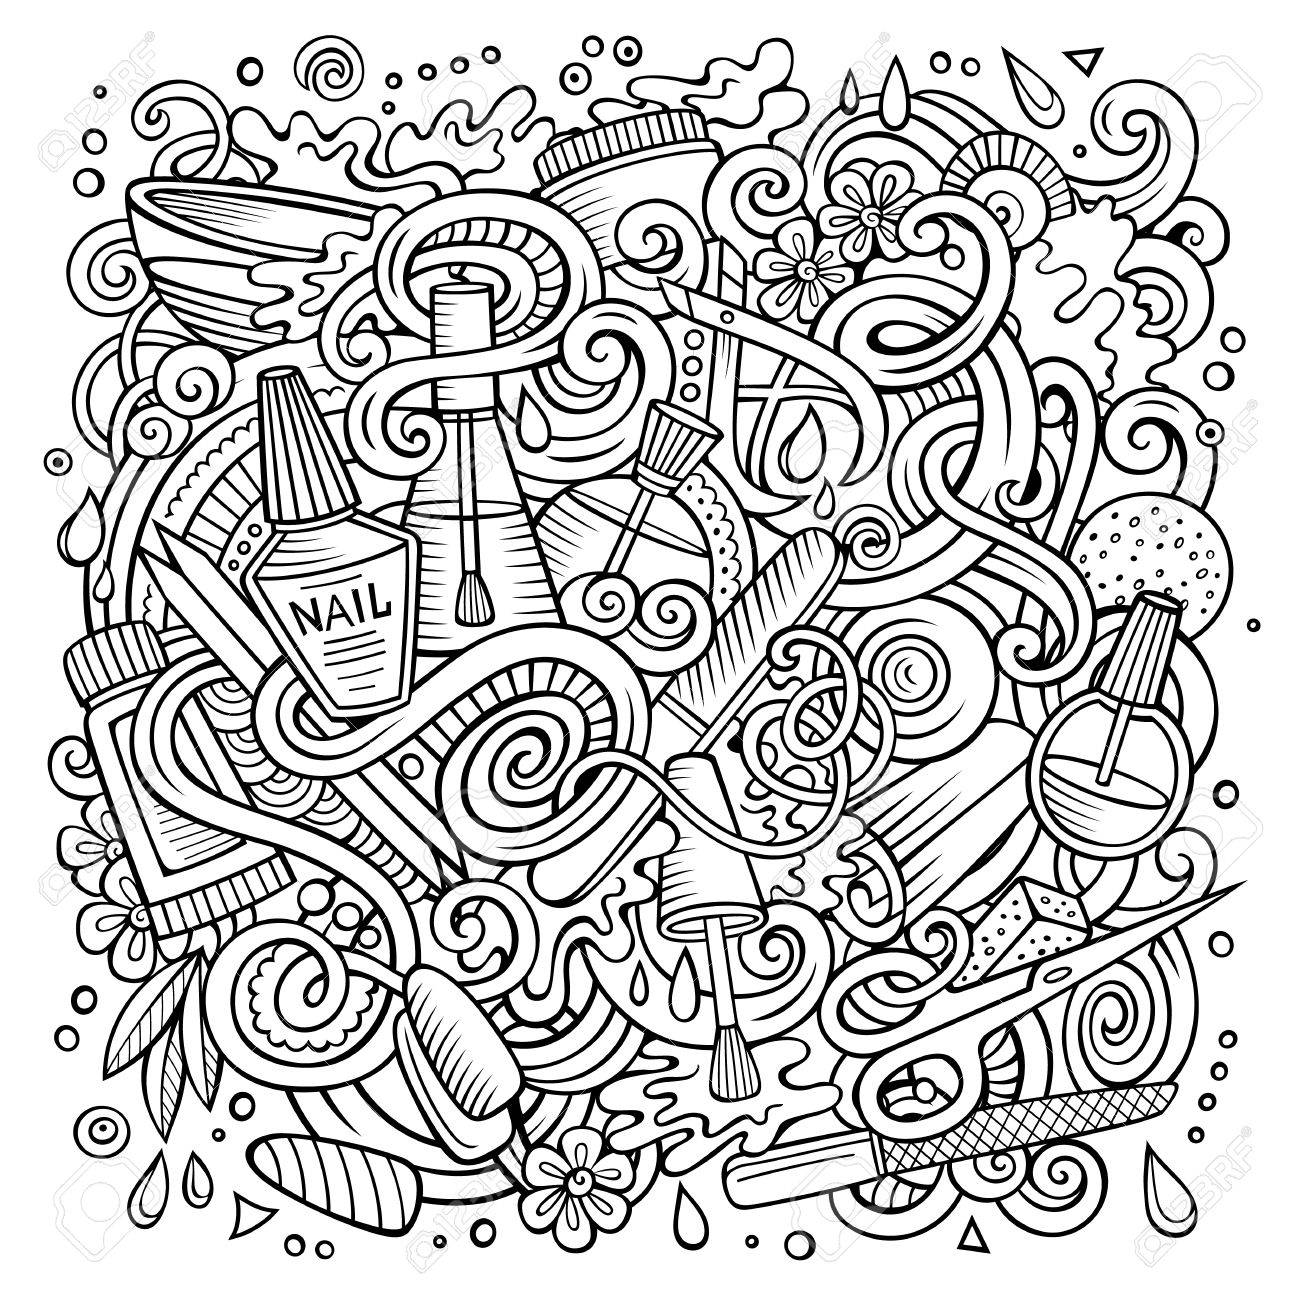 Cartoon Doodles Nail Salon Illustration Royalty Free Cliparts ...